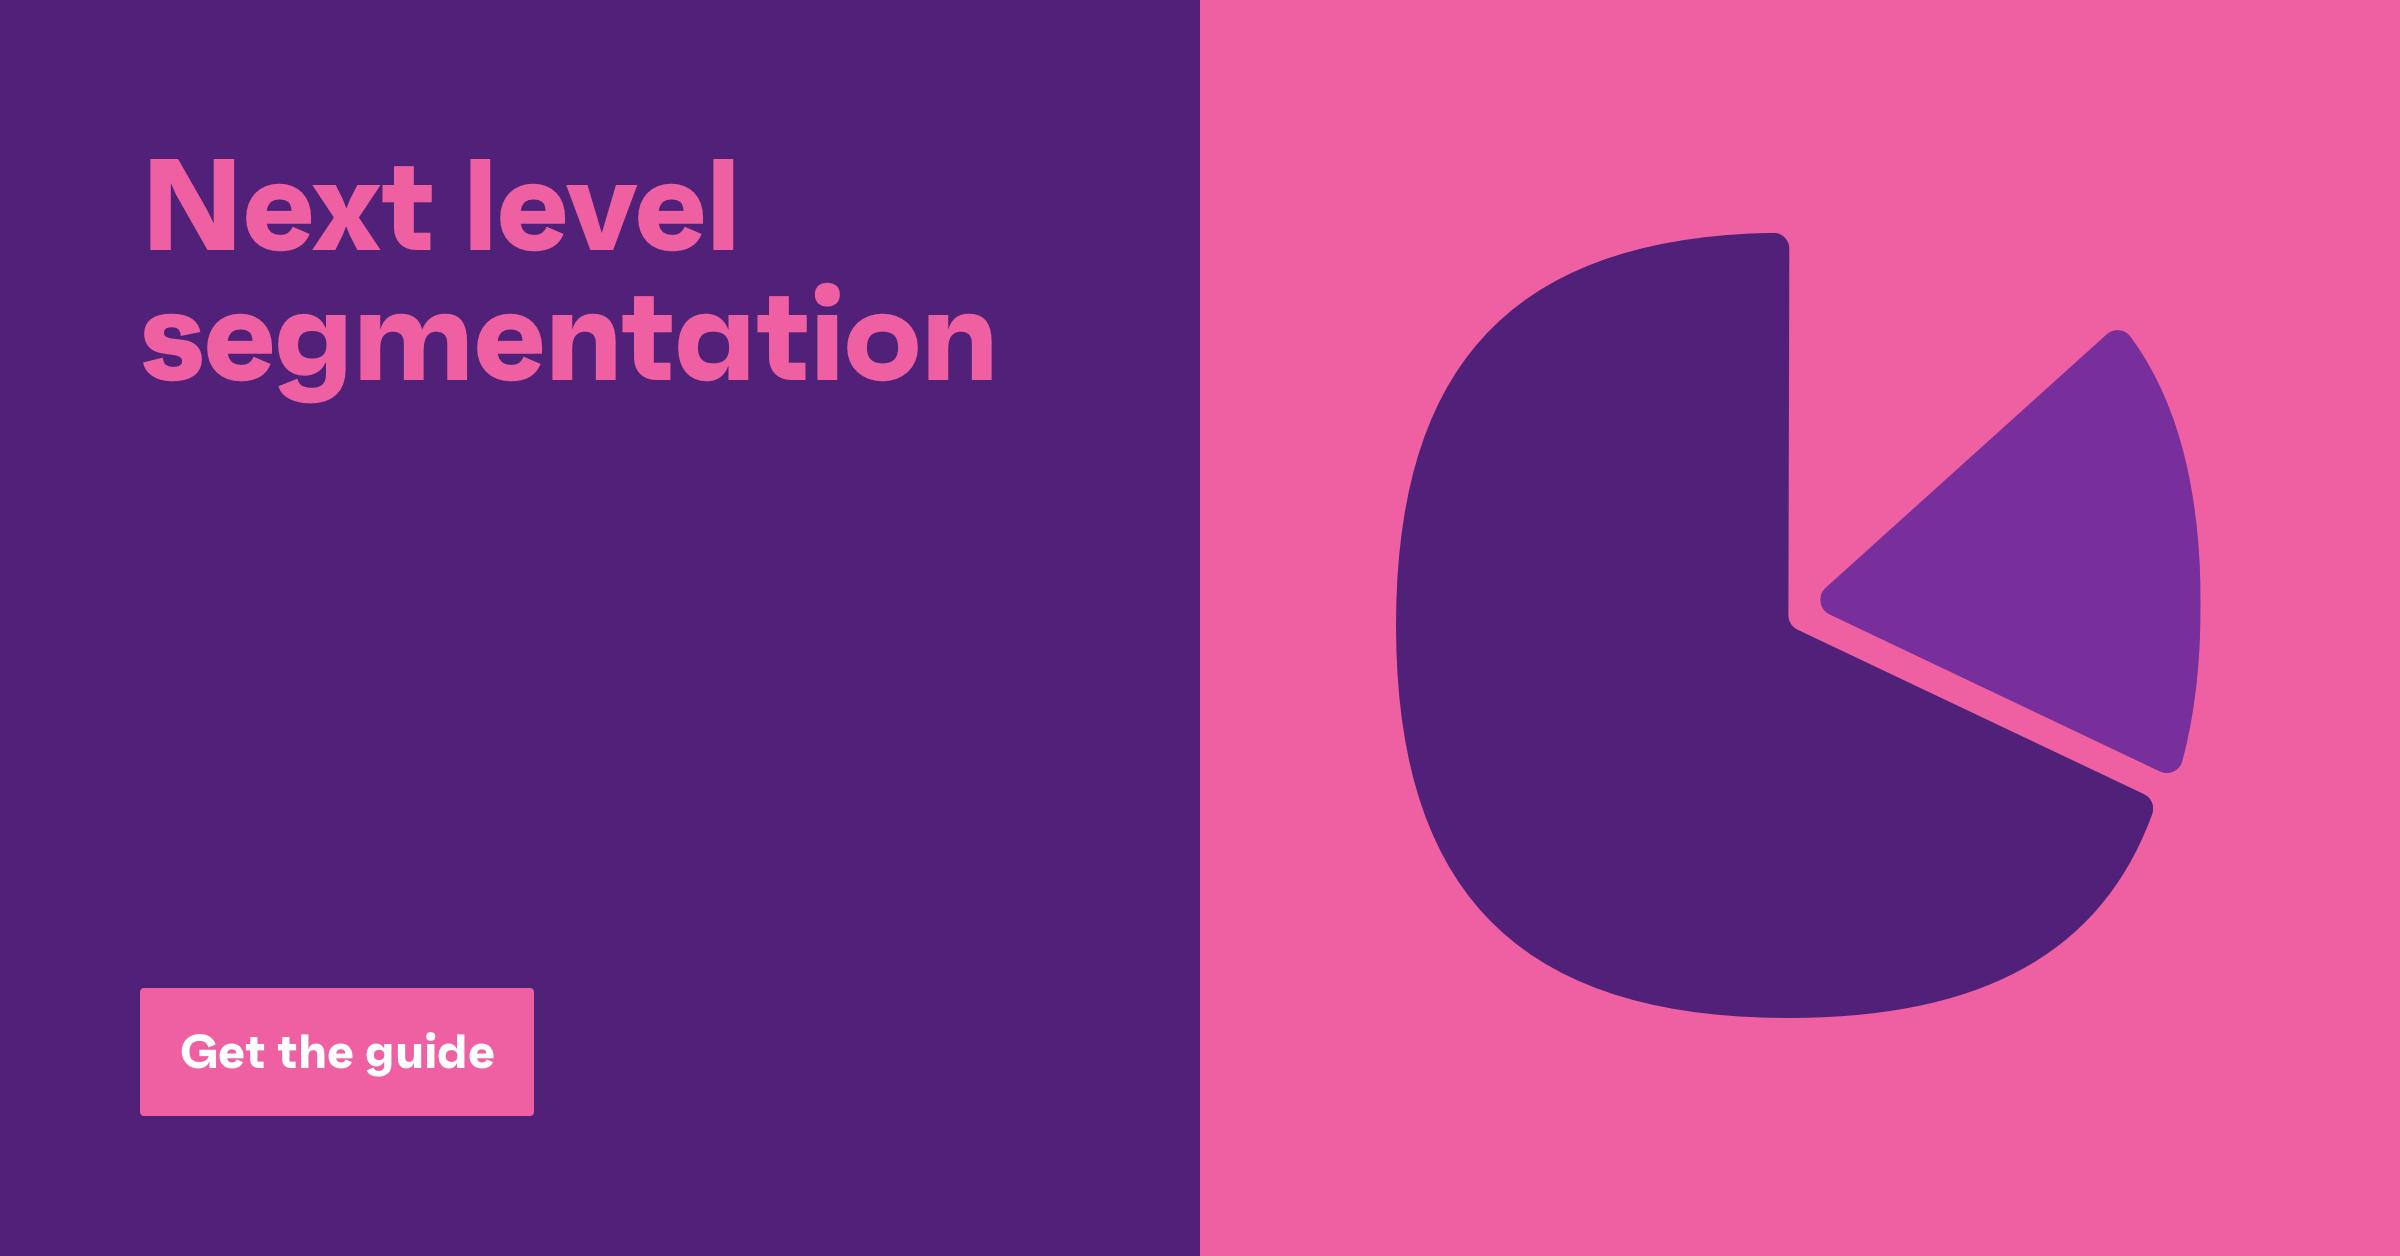 Next level segmentation